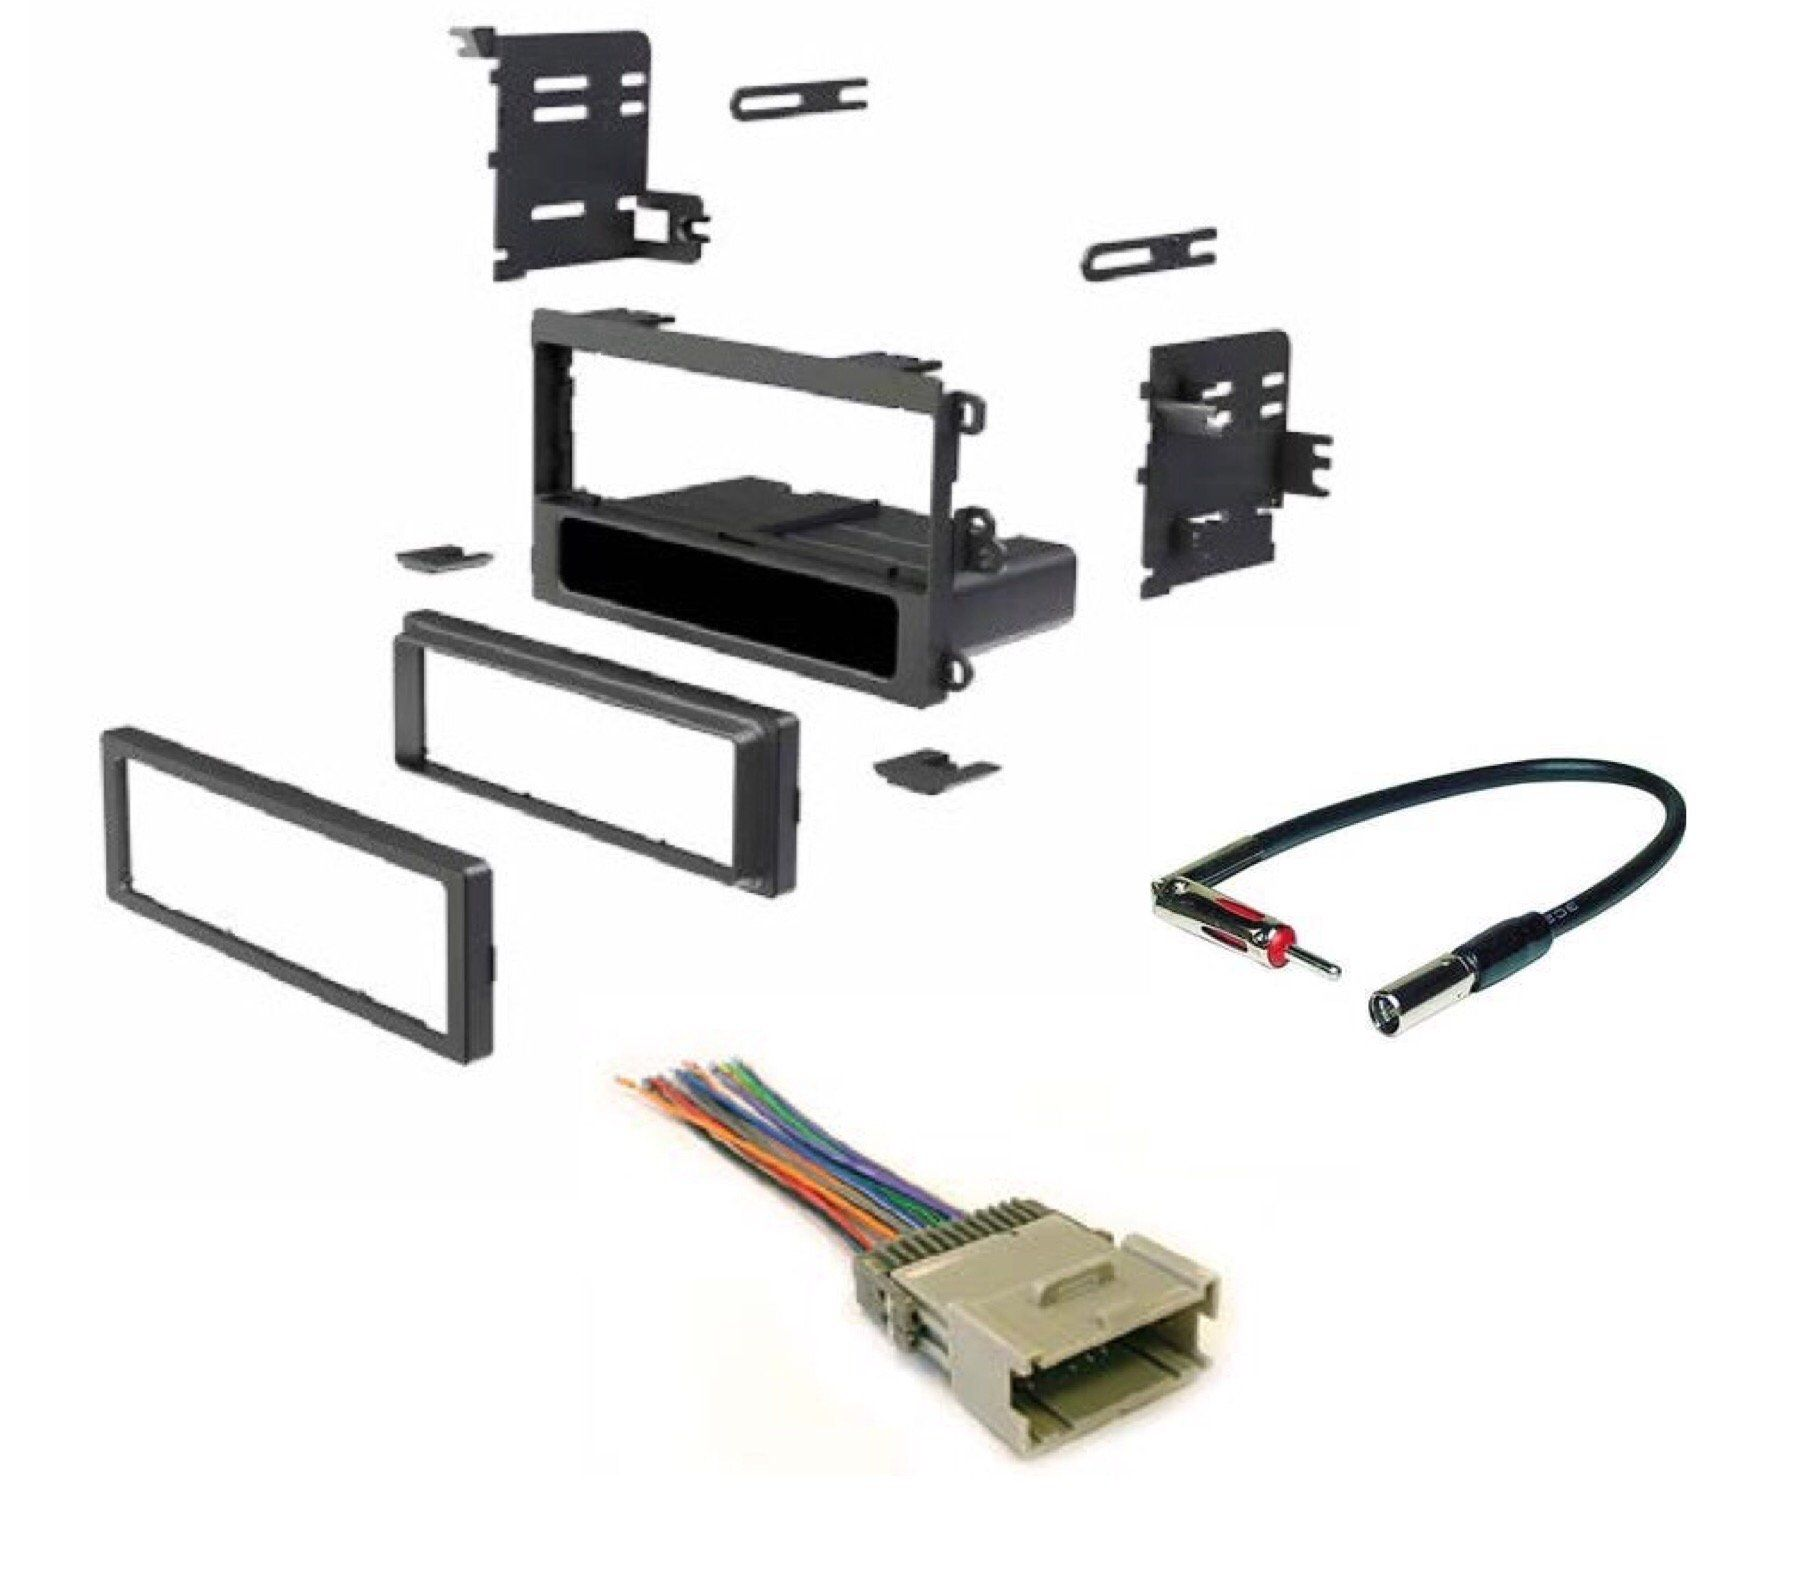 medium resolution of asc single din car radio dash kit wire harness and antenna adapter for chevrolet 03 05 blazer s10 01 02 express 00 01 metro 98 04 tracker